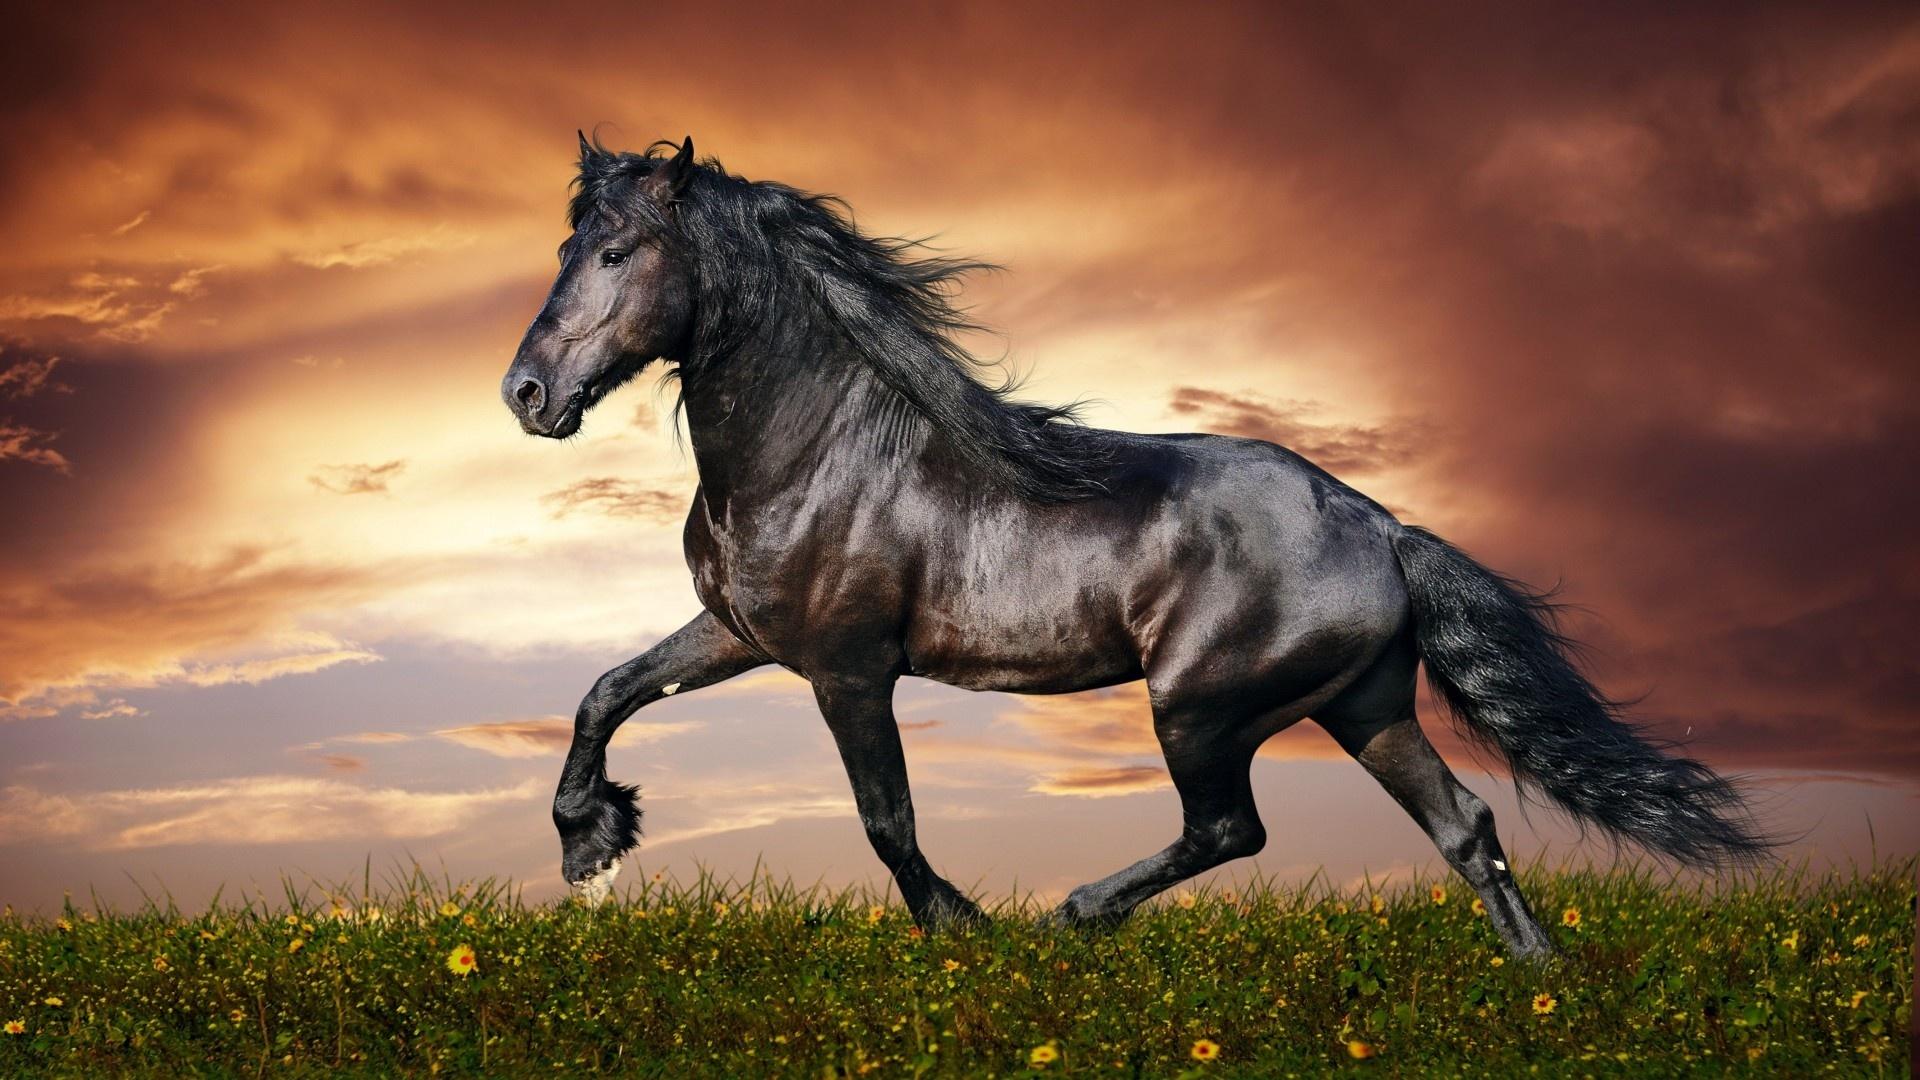 Black Horse best background